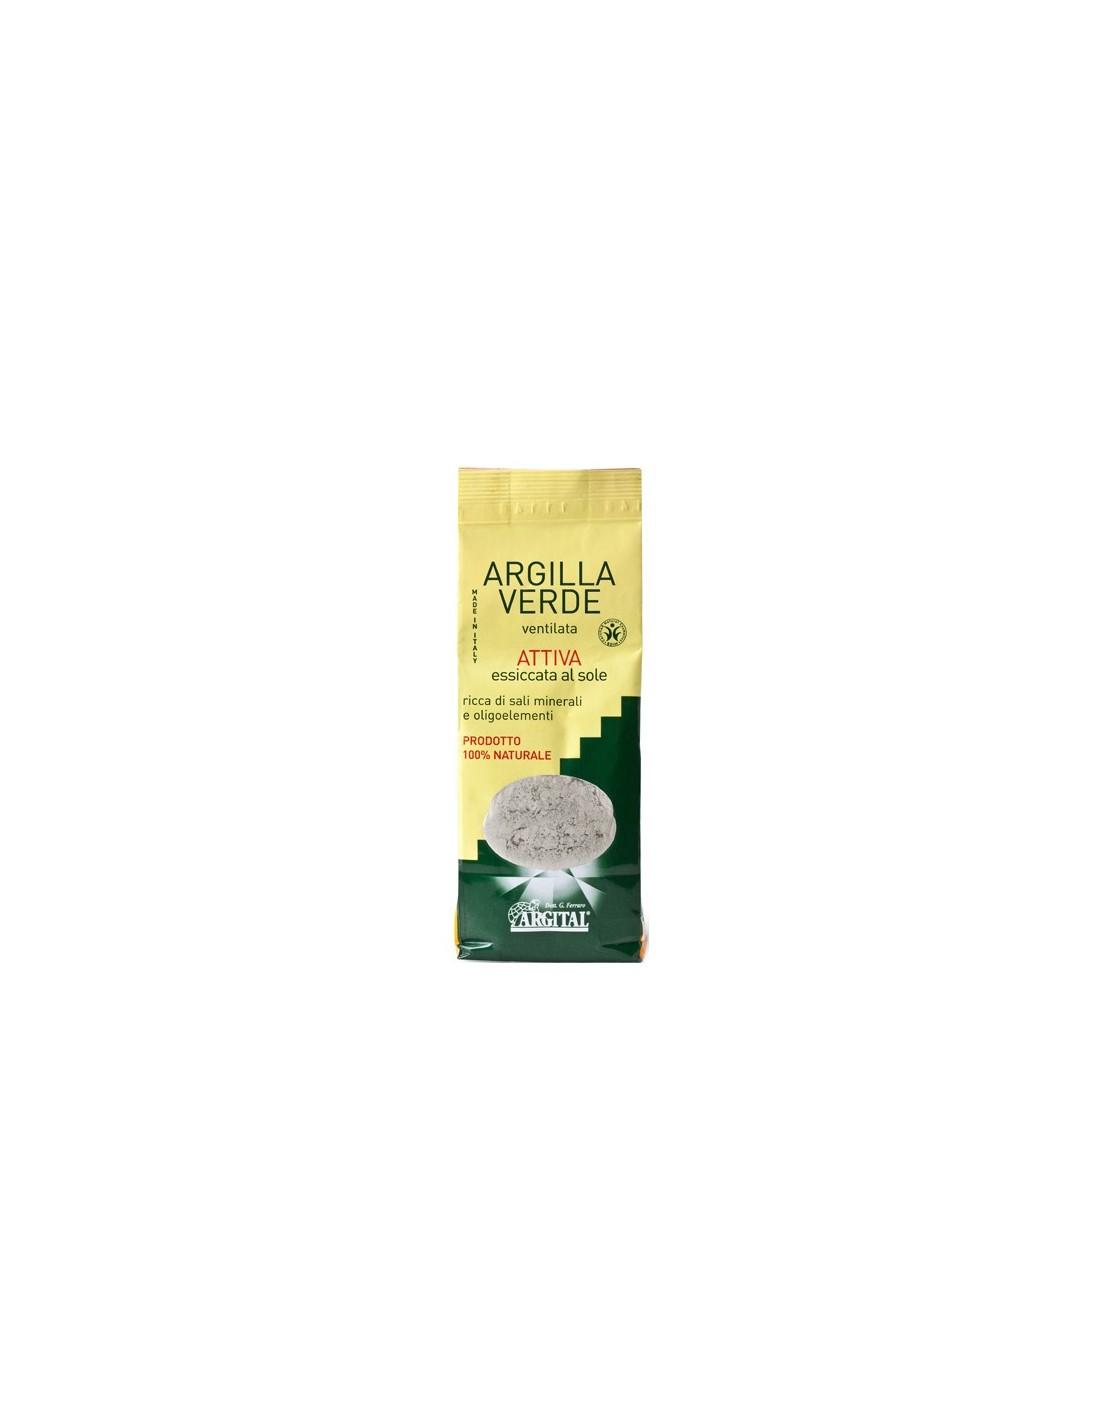 Image of Argital Argilla Verde Ventilata 500g 901994311